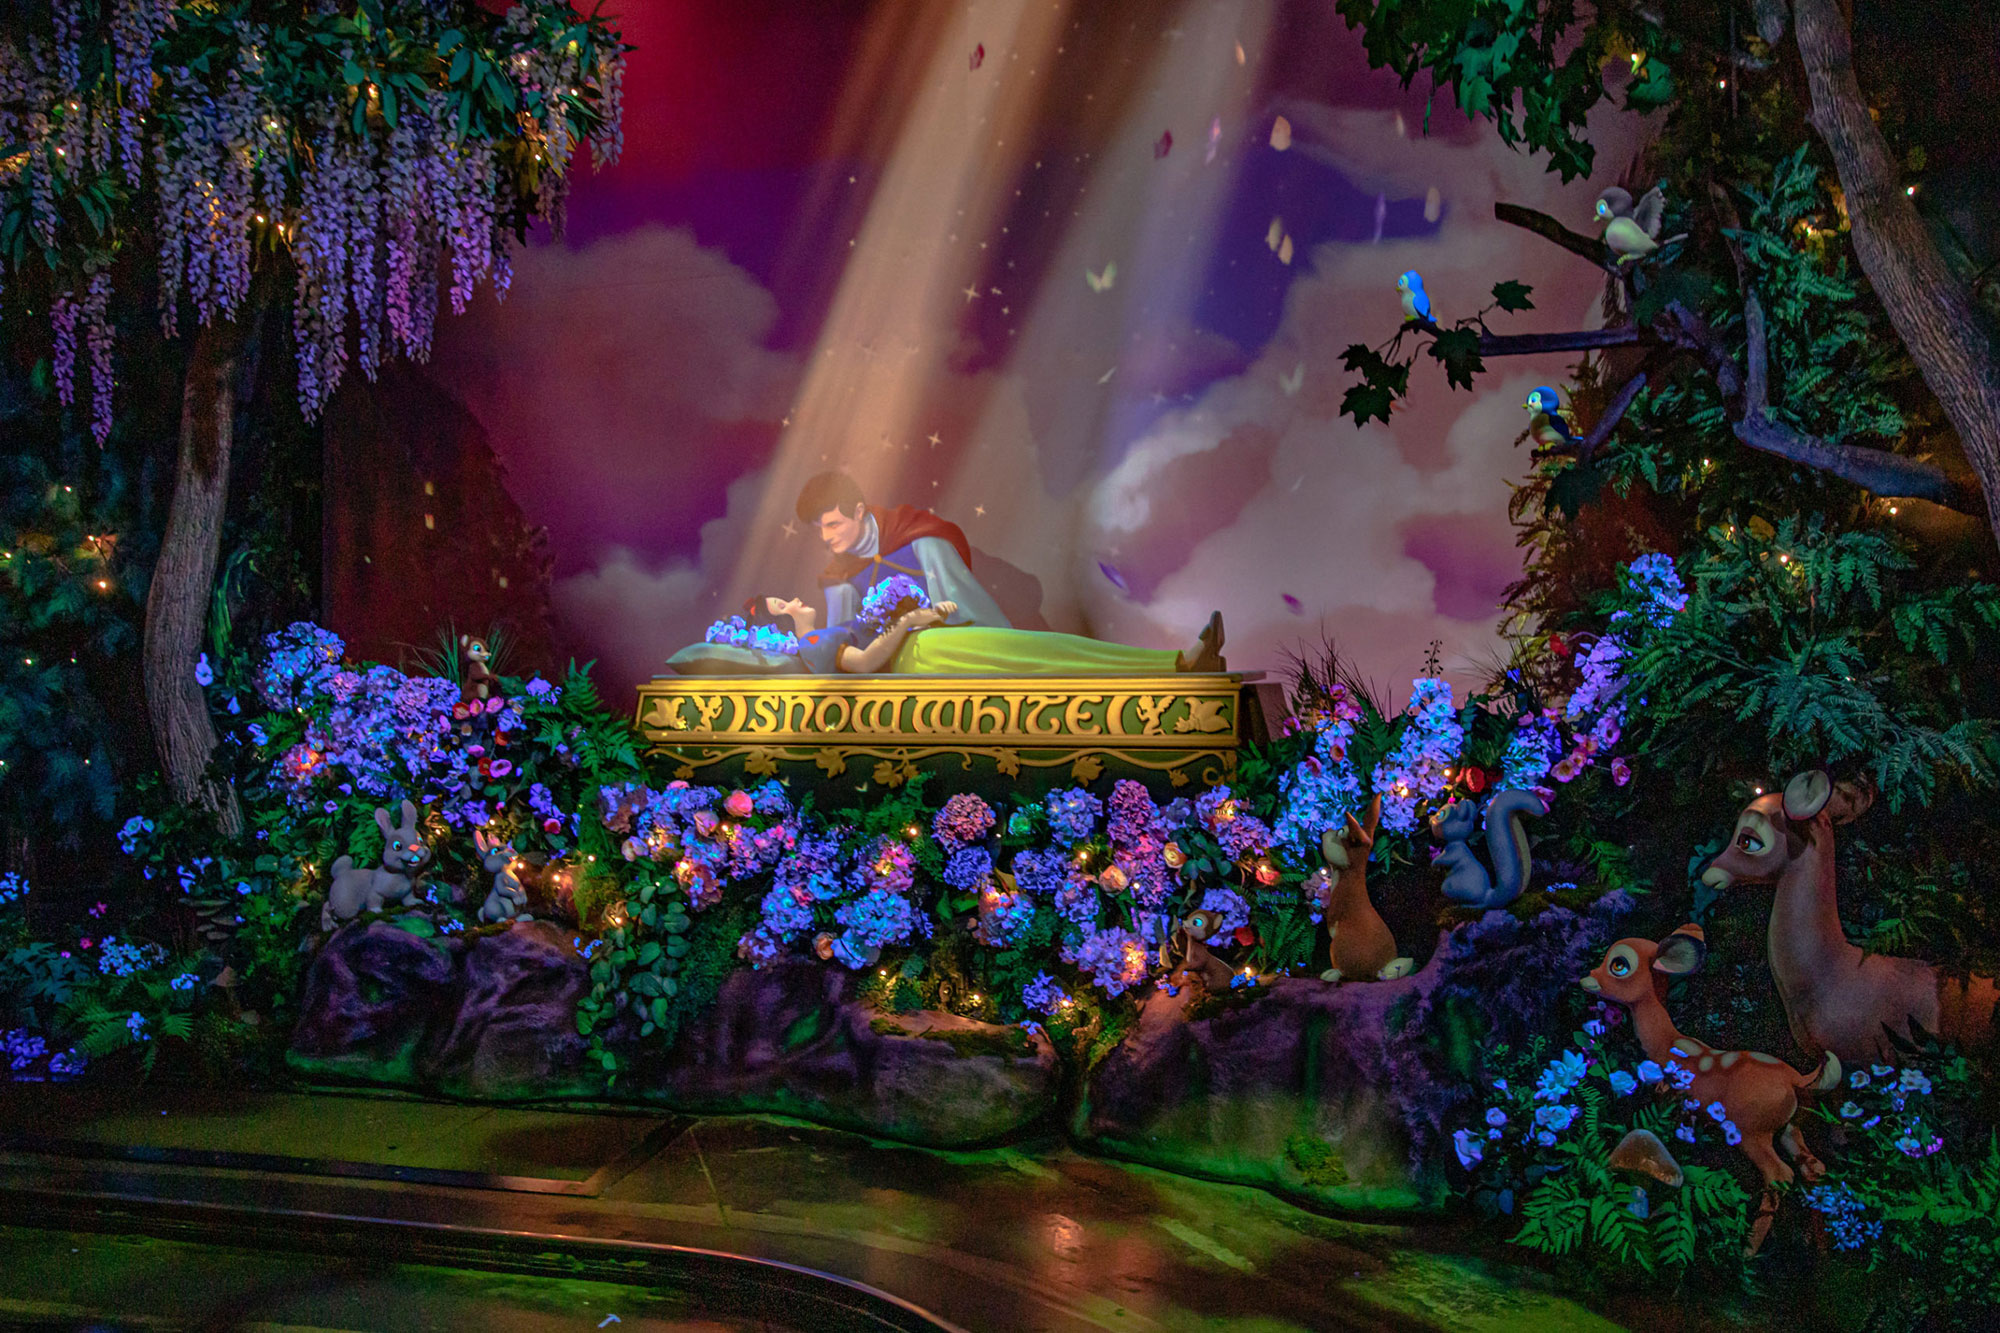 Snow White's Enchanted Wish at Disneyland